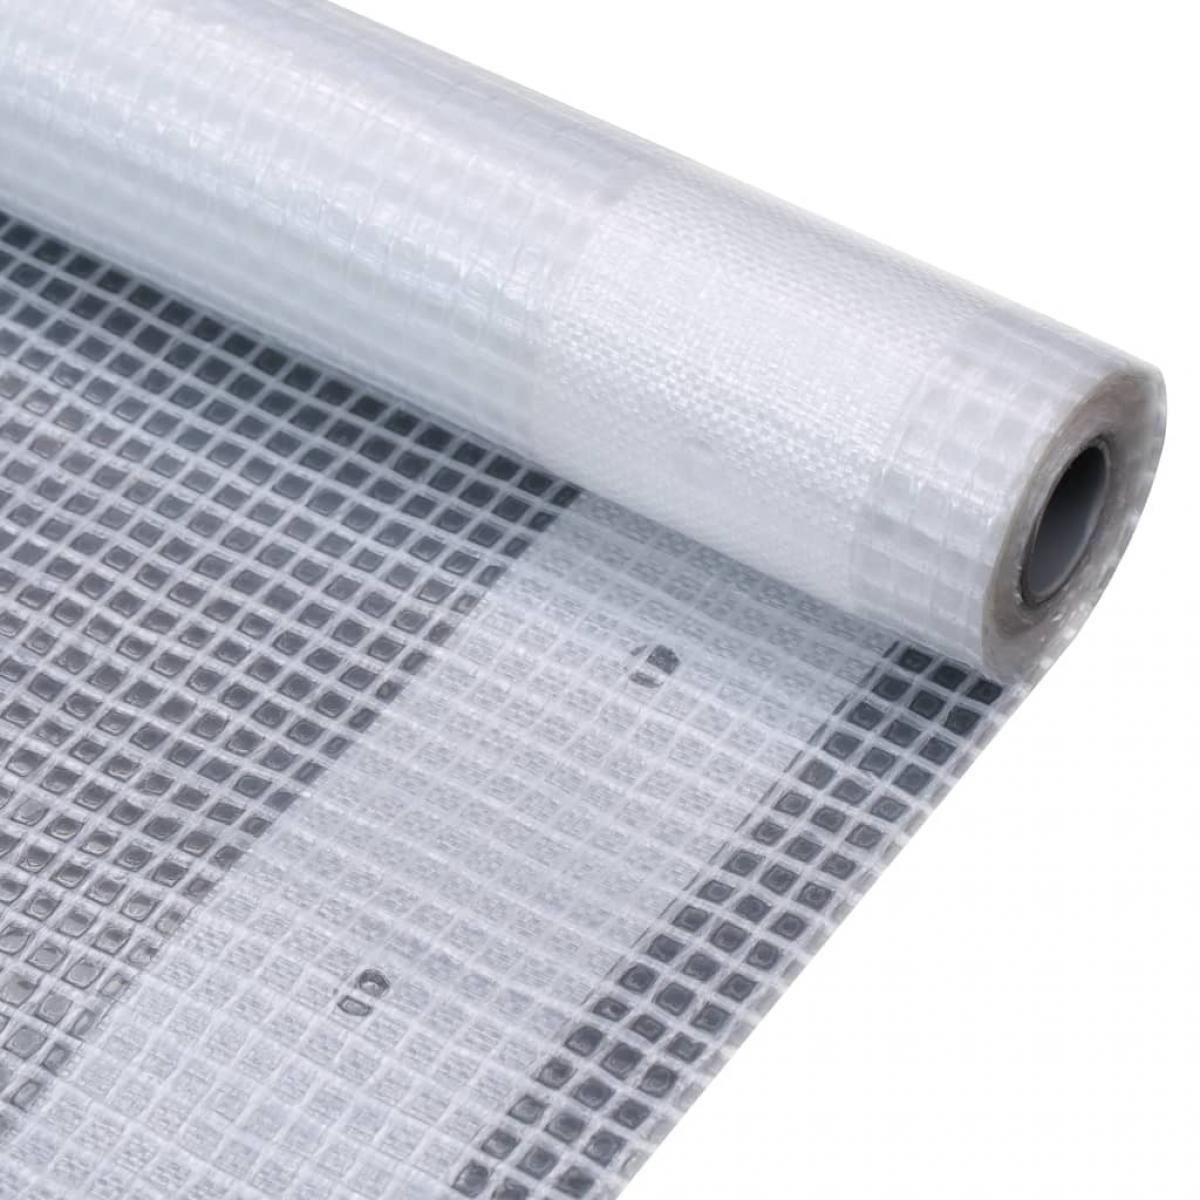 Vidaxl vidaXL Bâche Leno 260 g/m² 1,5 x 15 m Blanc